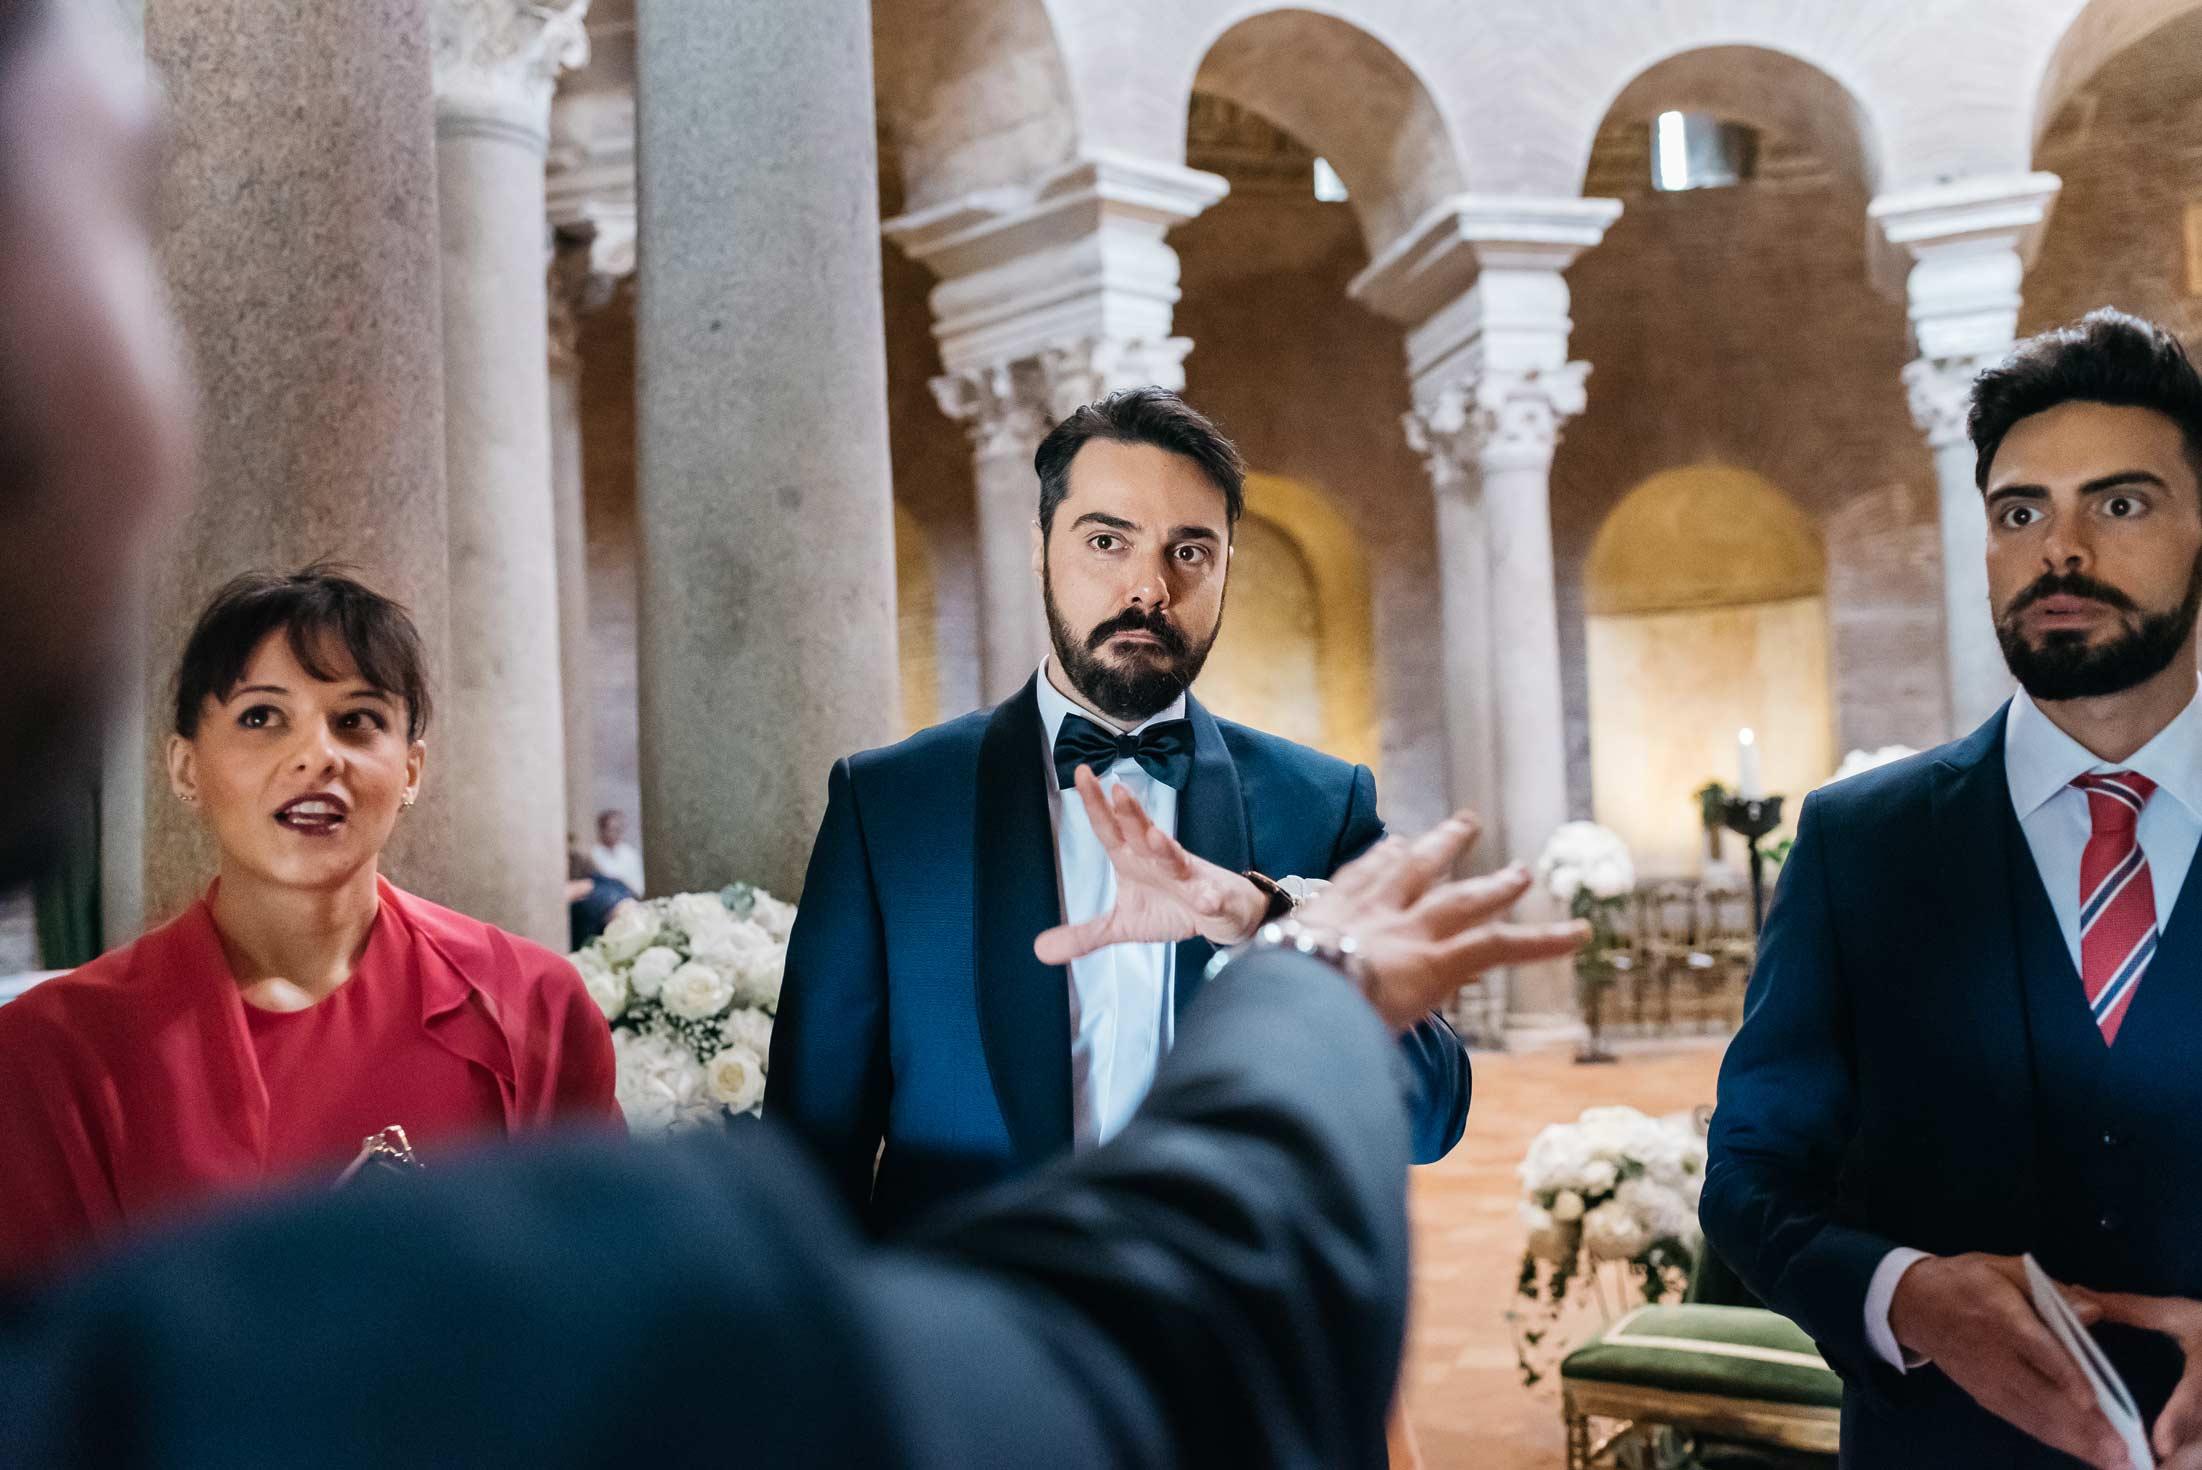 Wedding-Photographer-in-Italy-Destination-Wedding-Italy-Ceremony